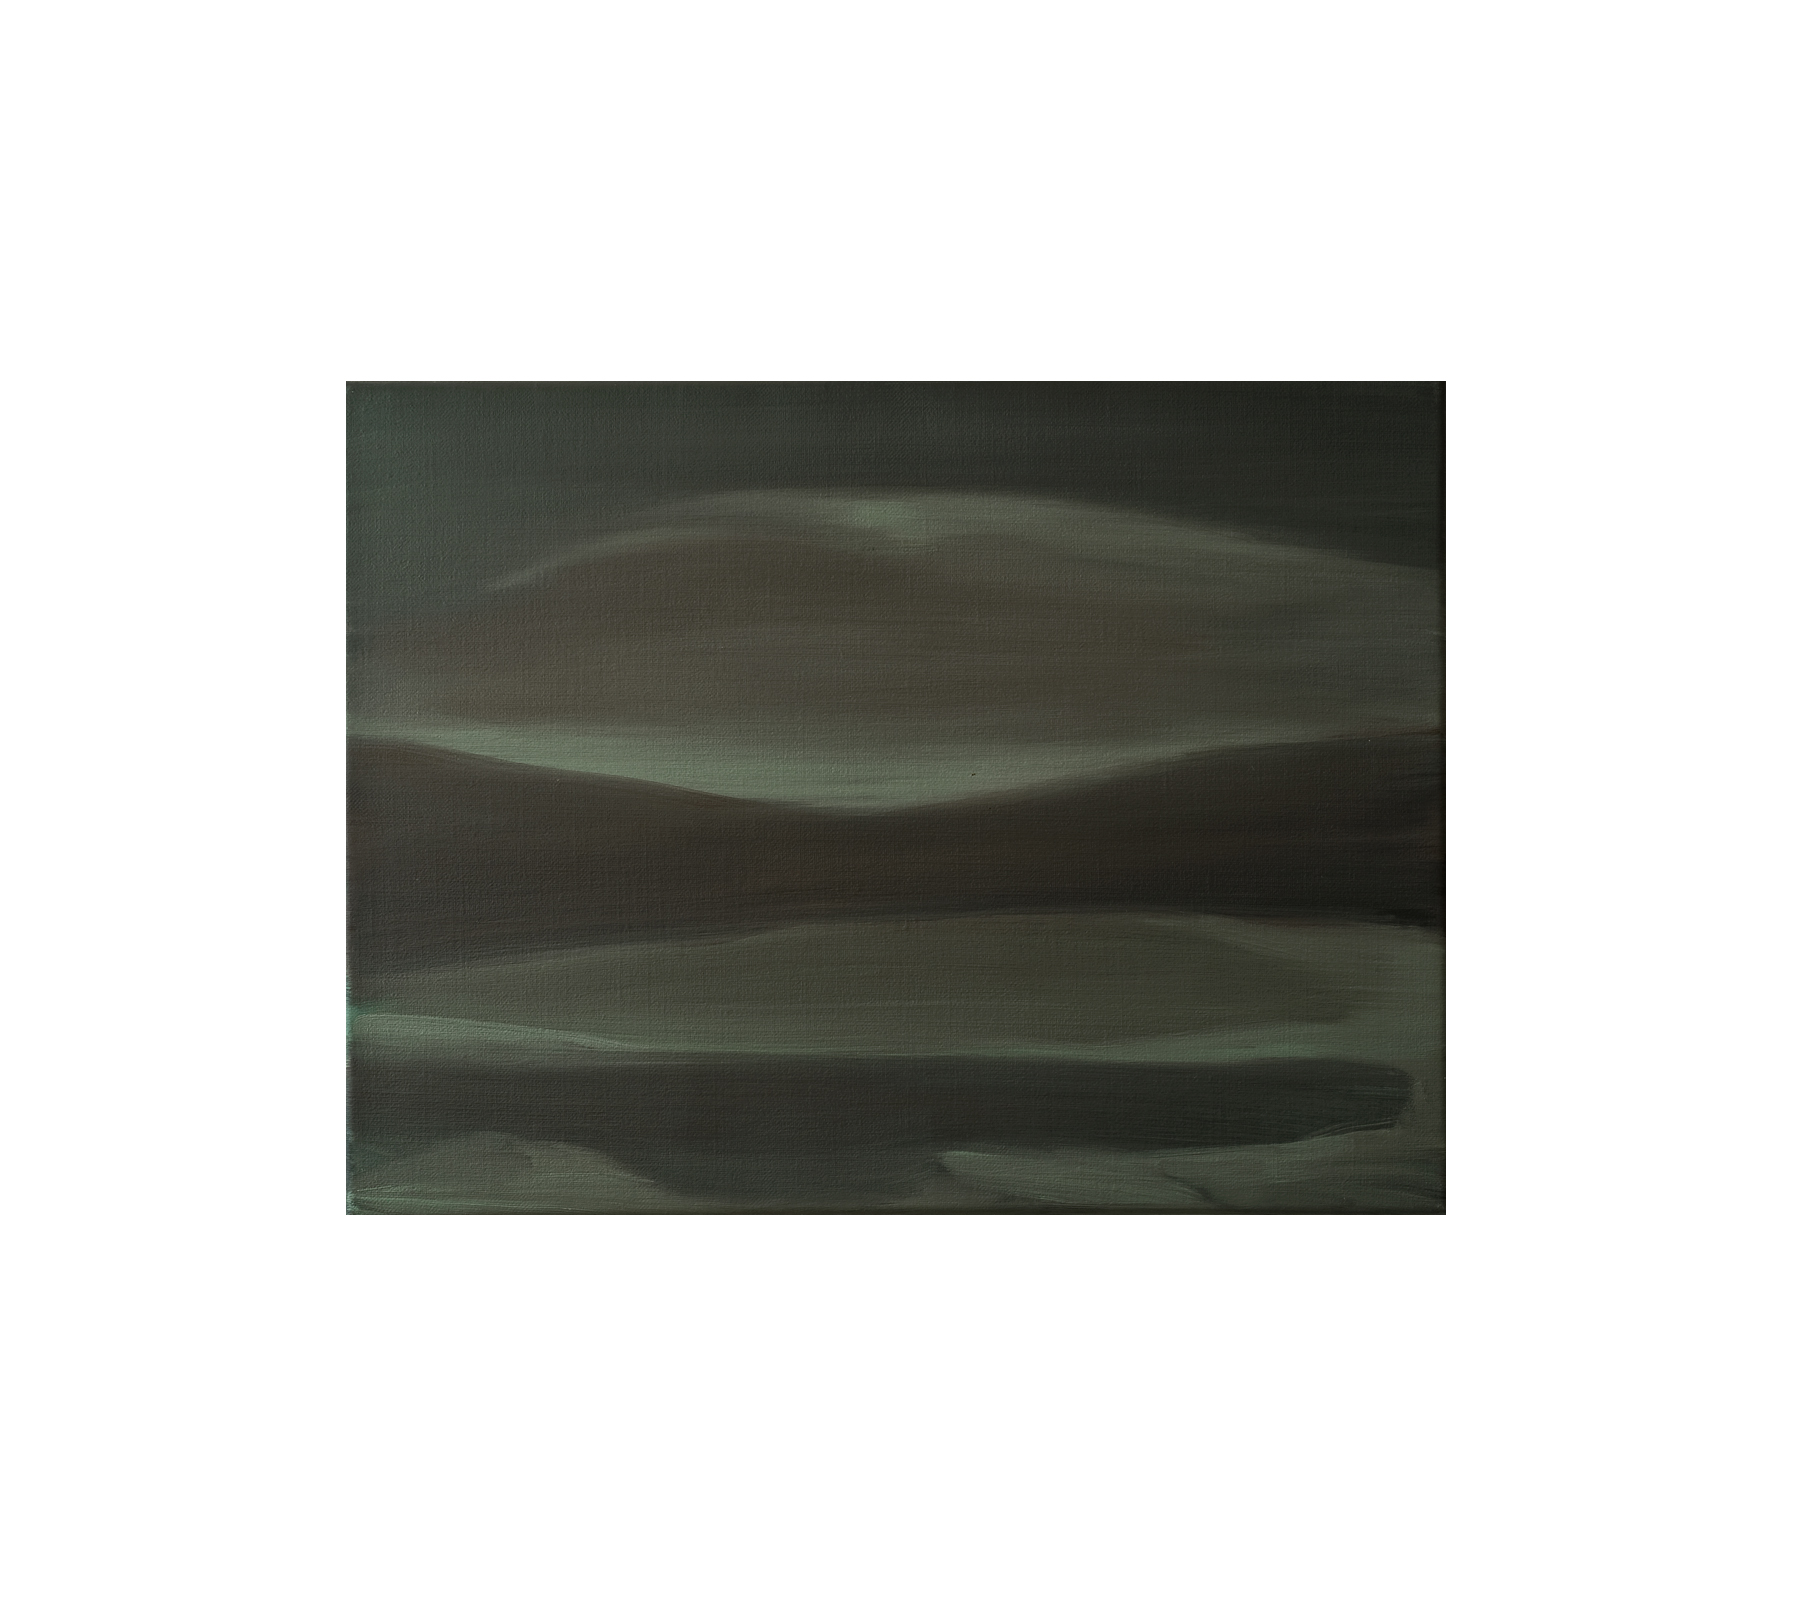 Untitled 2000 50x70cm